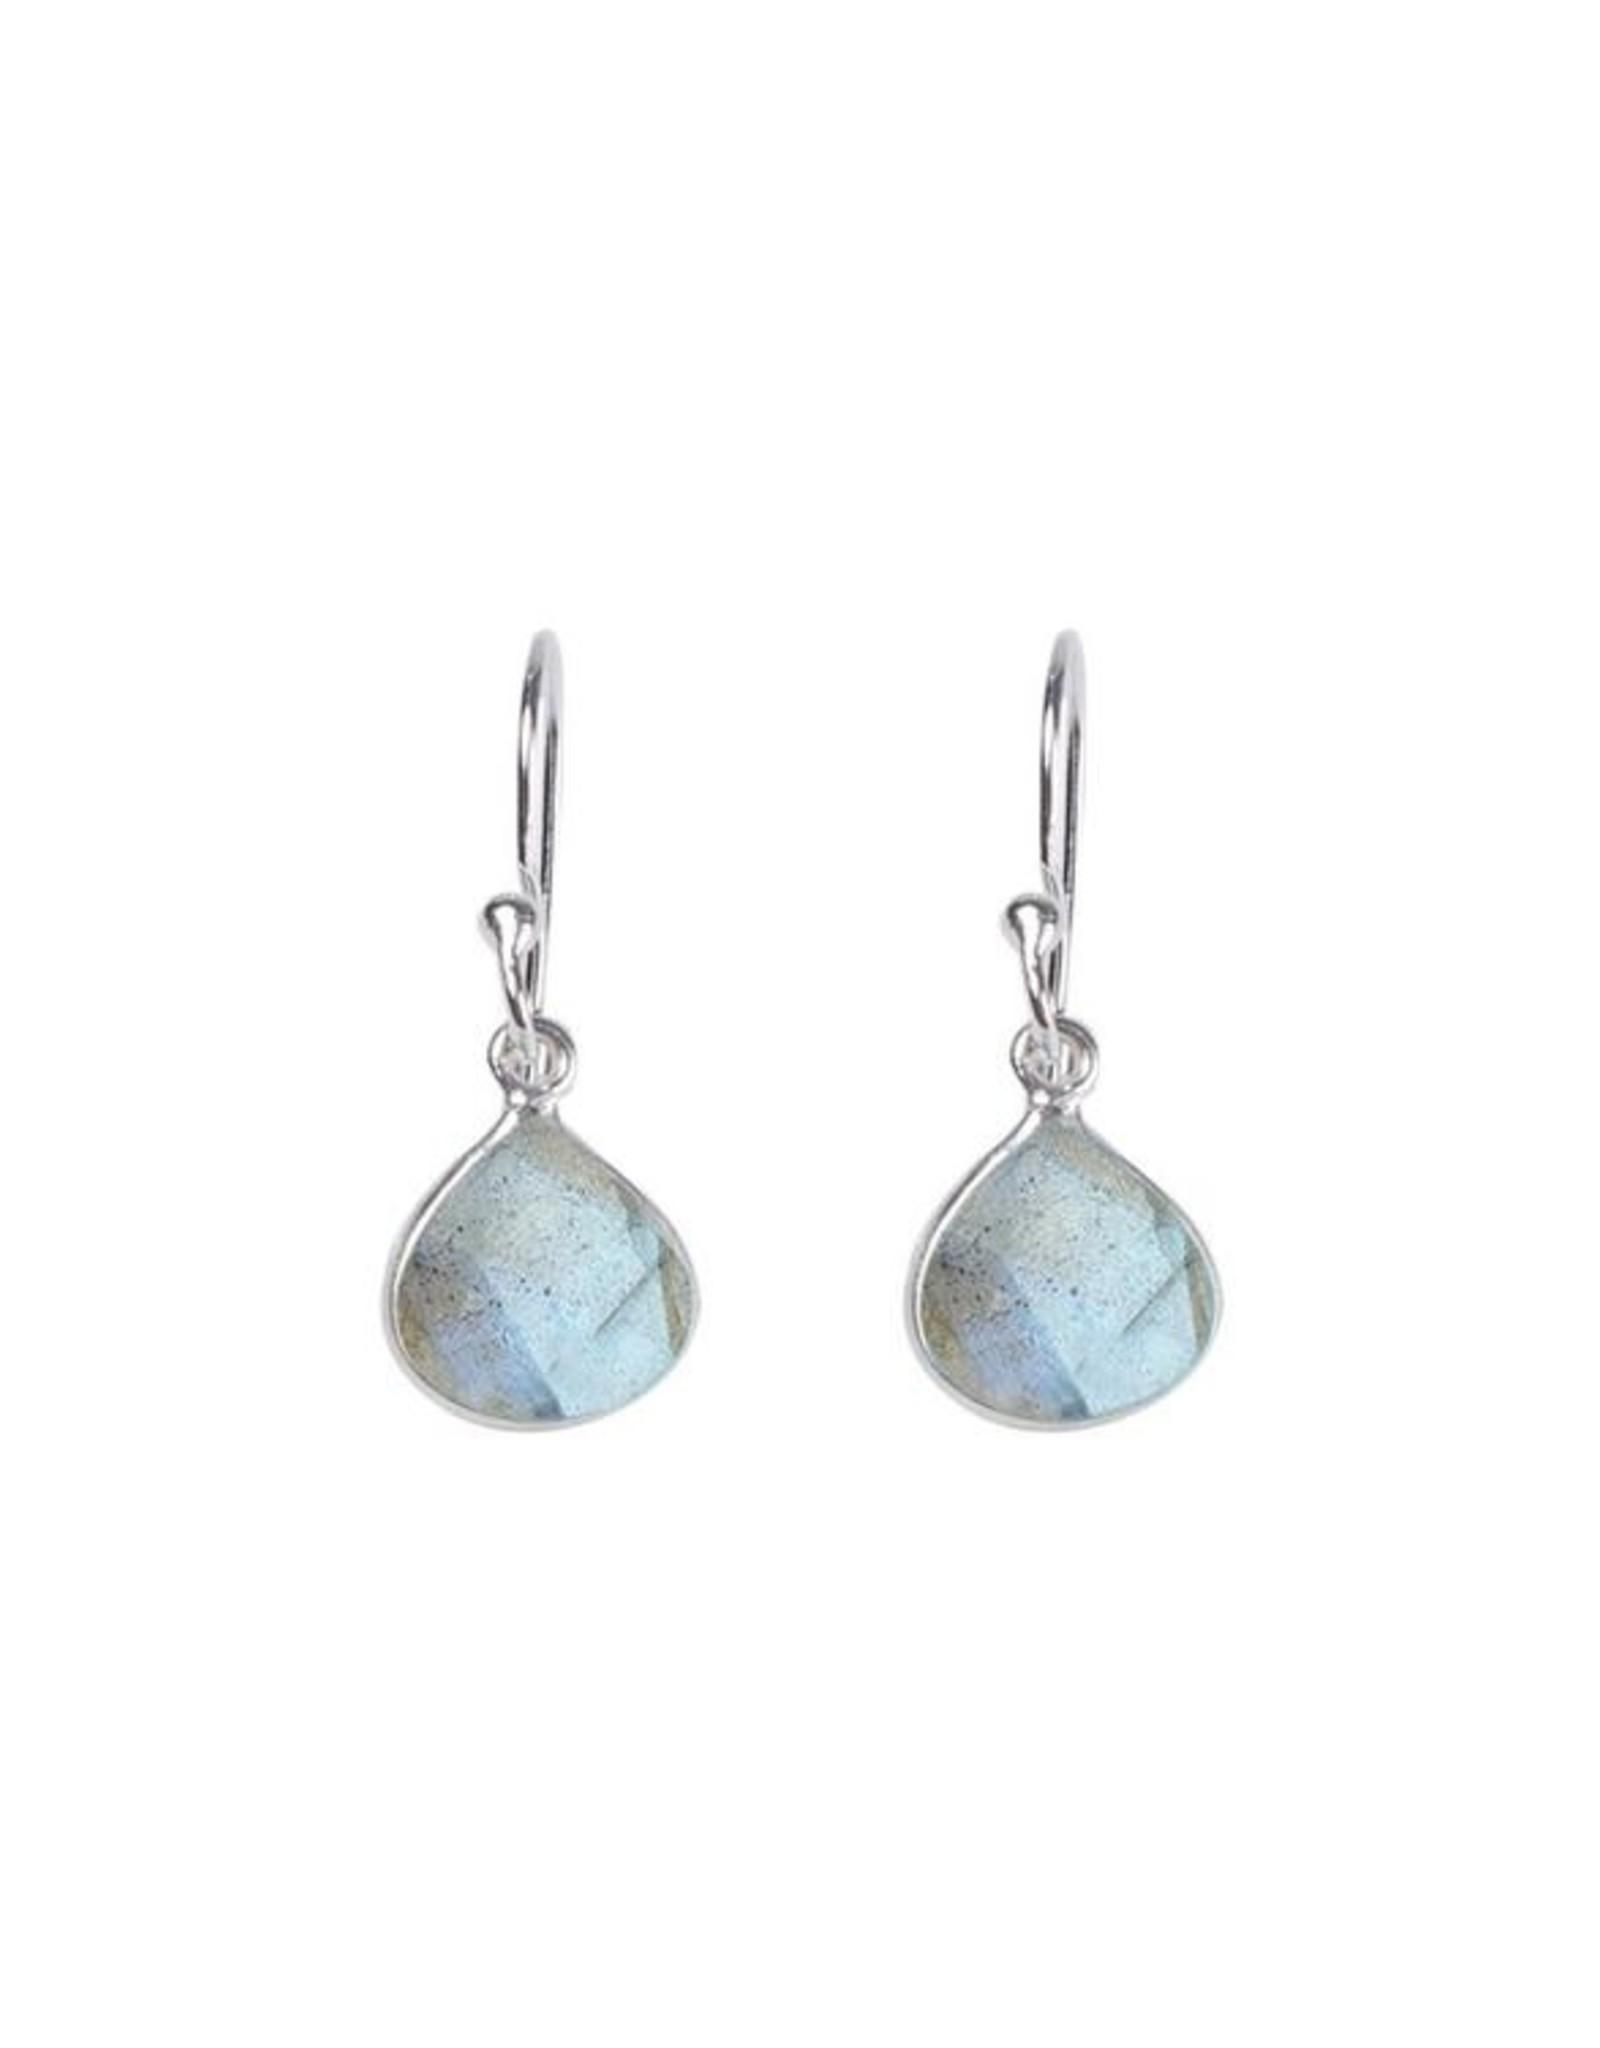 Ohrringe Small Drop Stone Labradorit 925 Silber